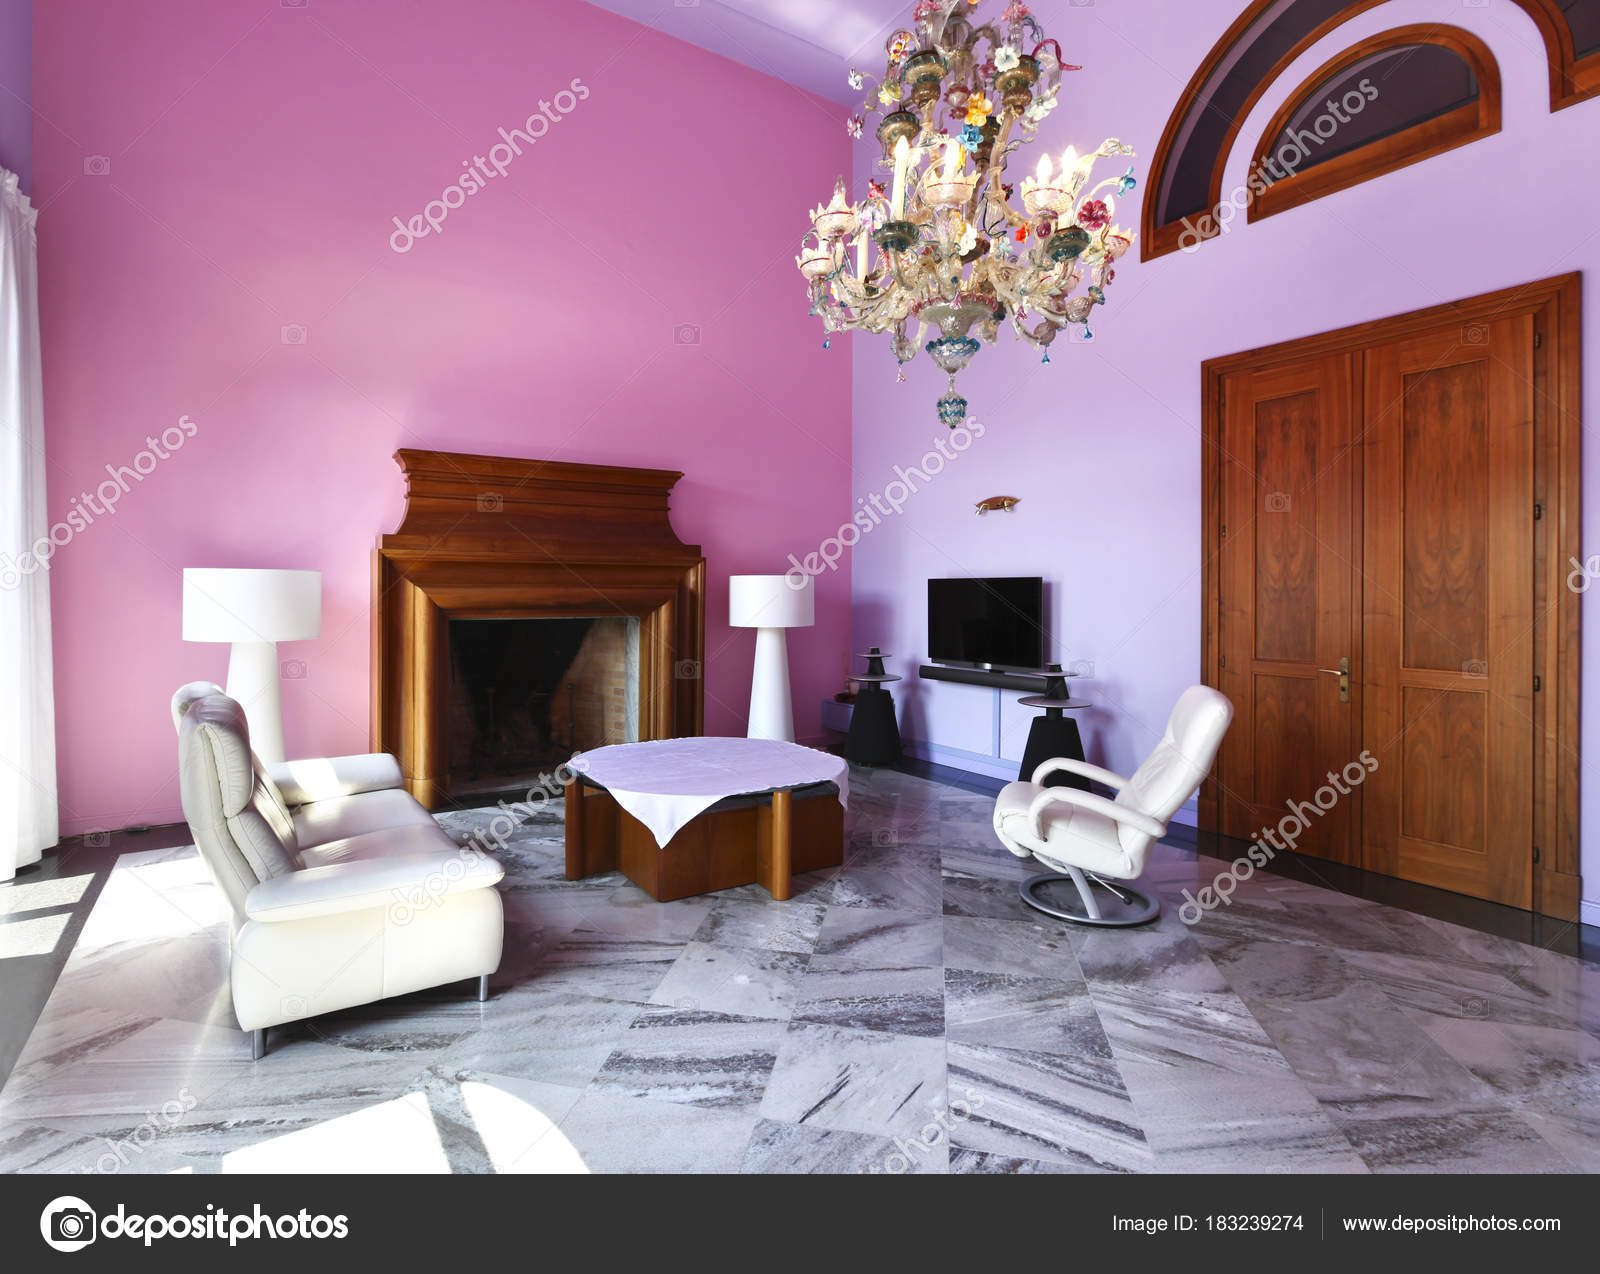 Vista di casa interni di lusso foto stock zveiger 183239274 - Foto case di lusso interni ...